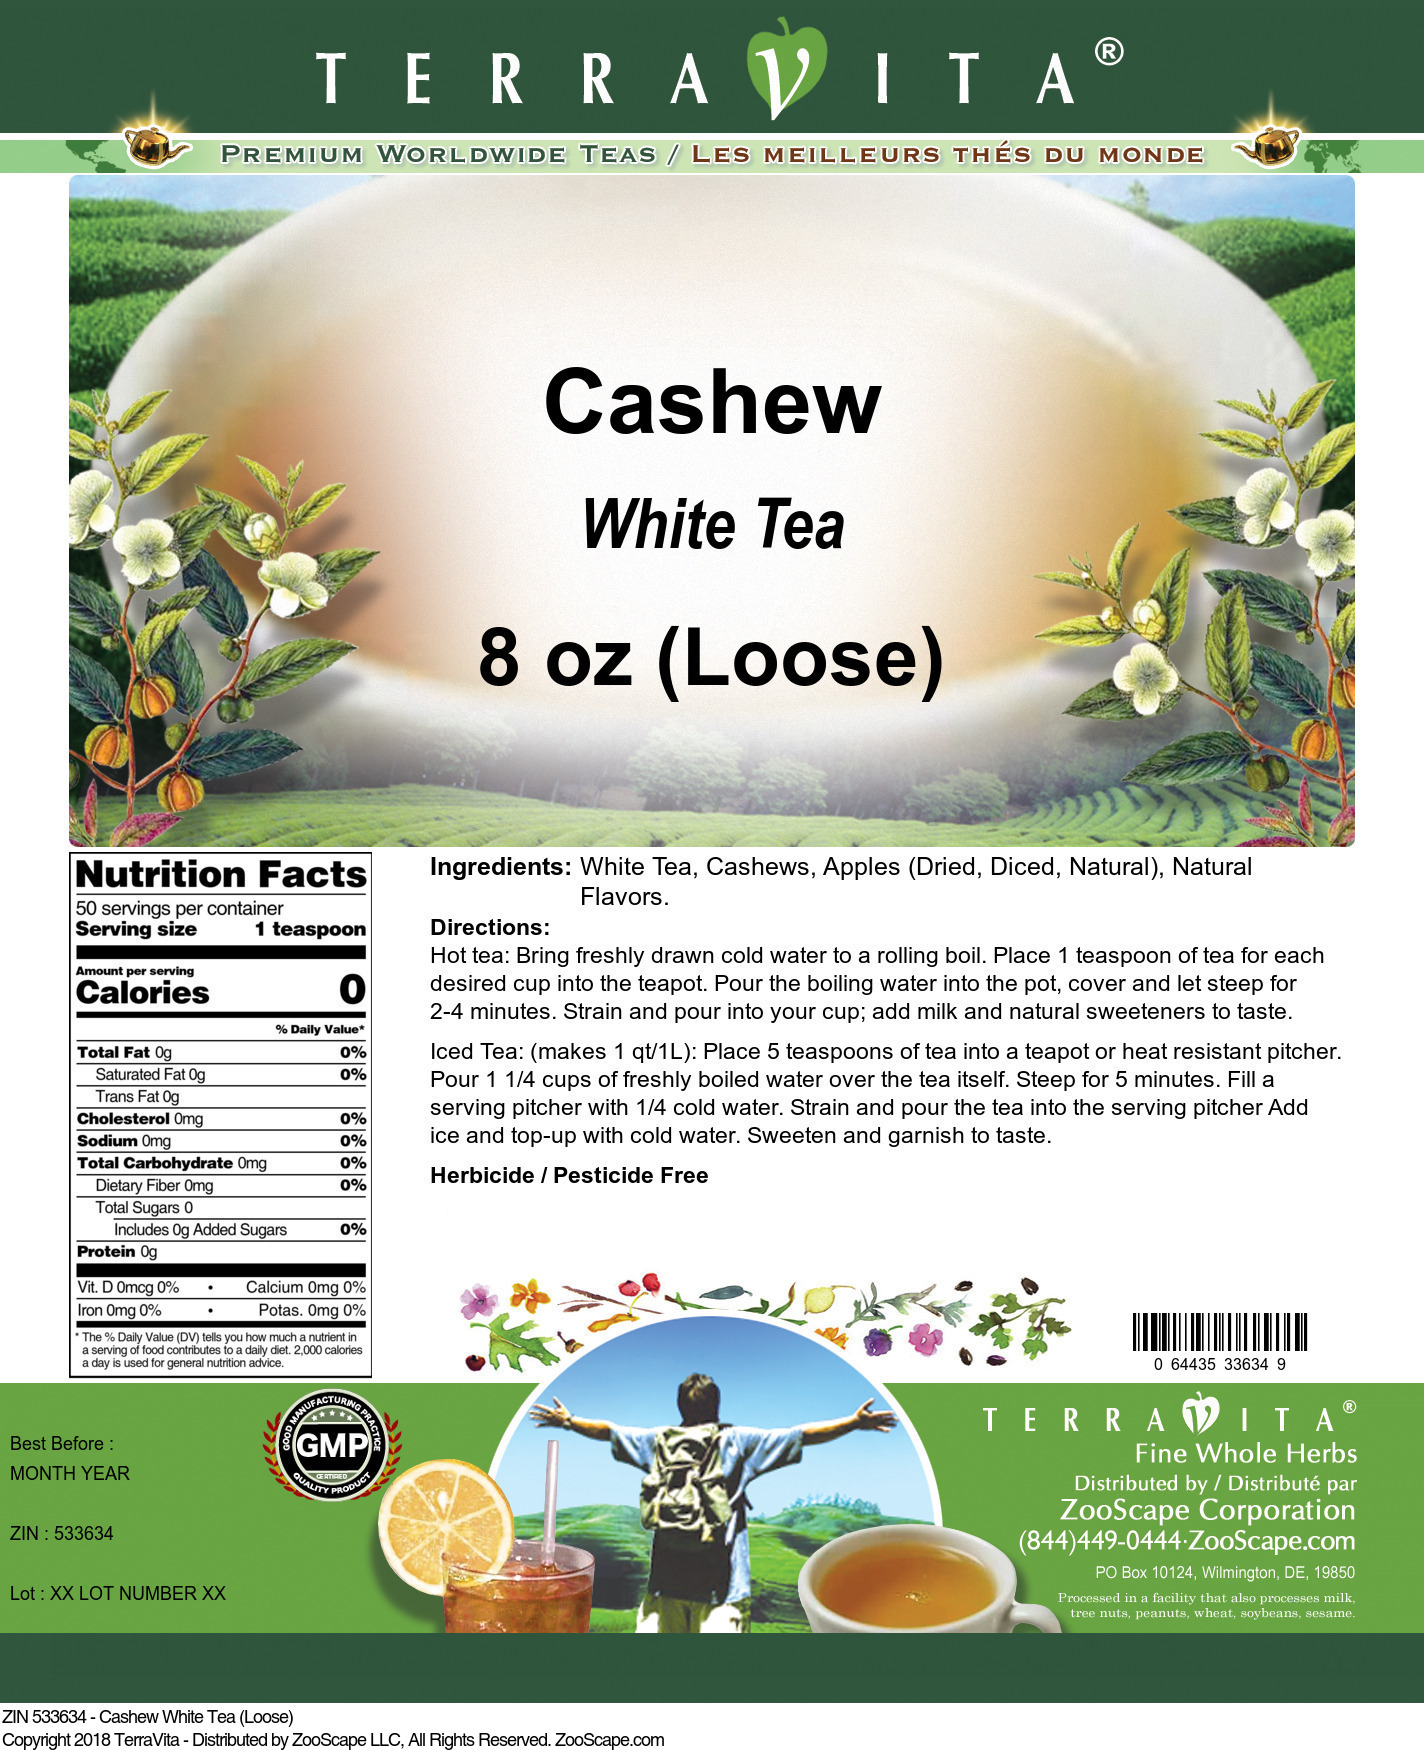 Cashew White Tea (Loose)